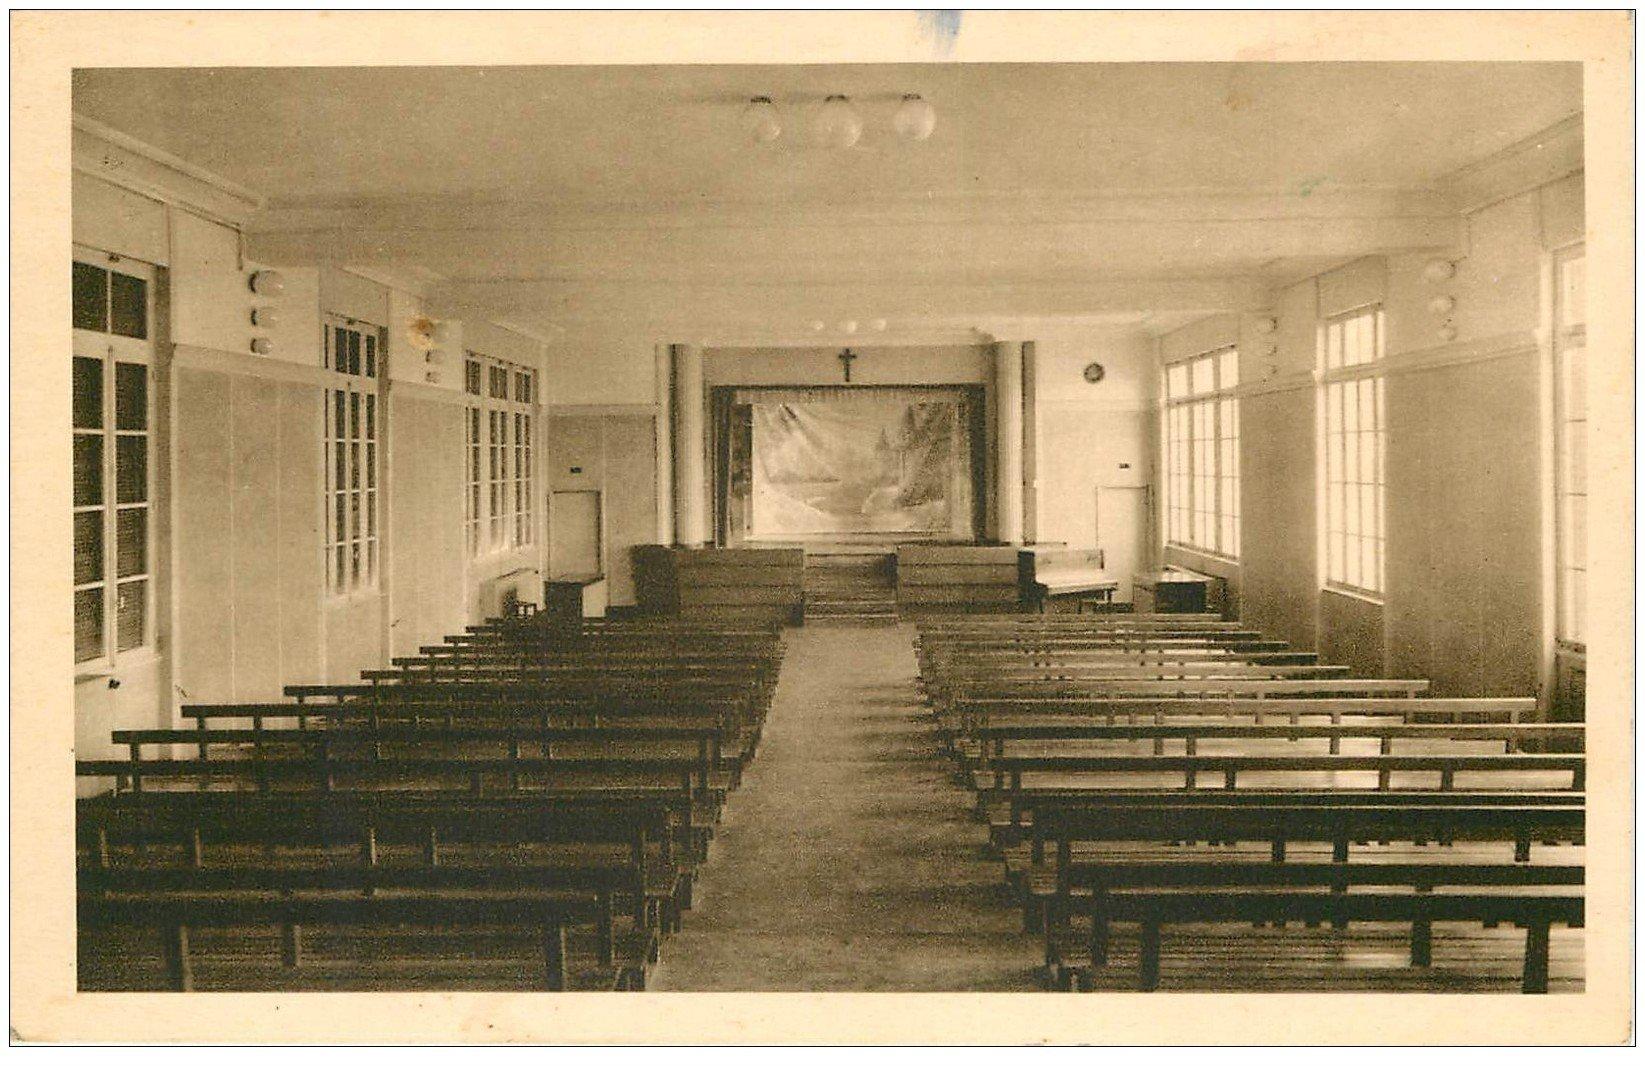 63 clermont ferrand salle de r union institution saint alyre 1946. Black Bedroom Furniture Sets. Home Design Ideas